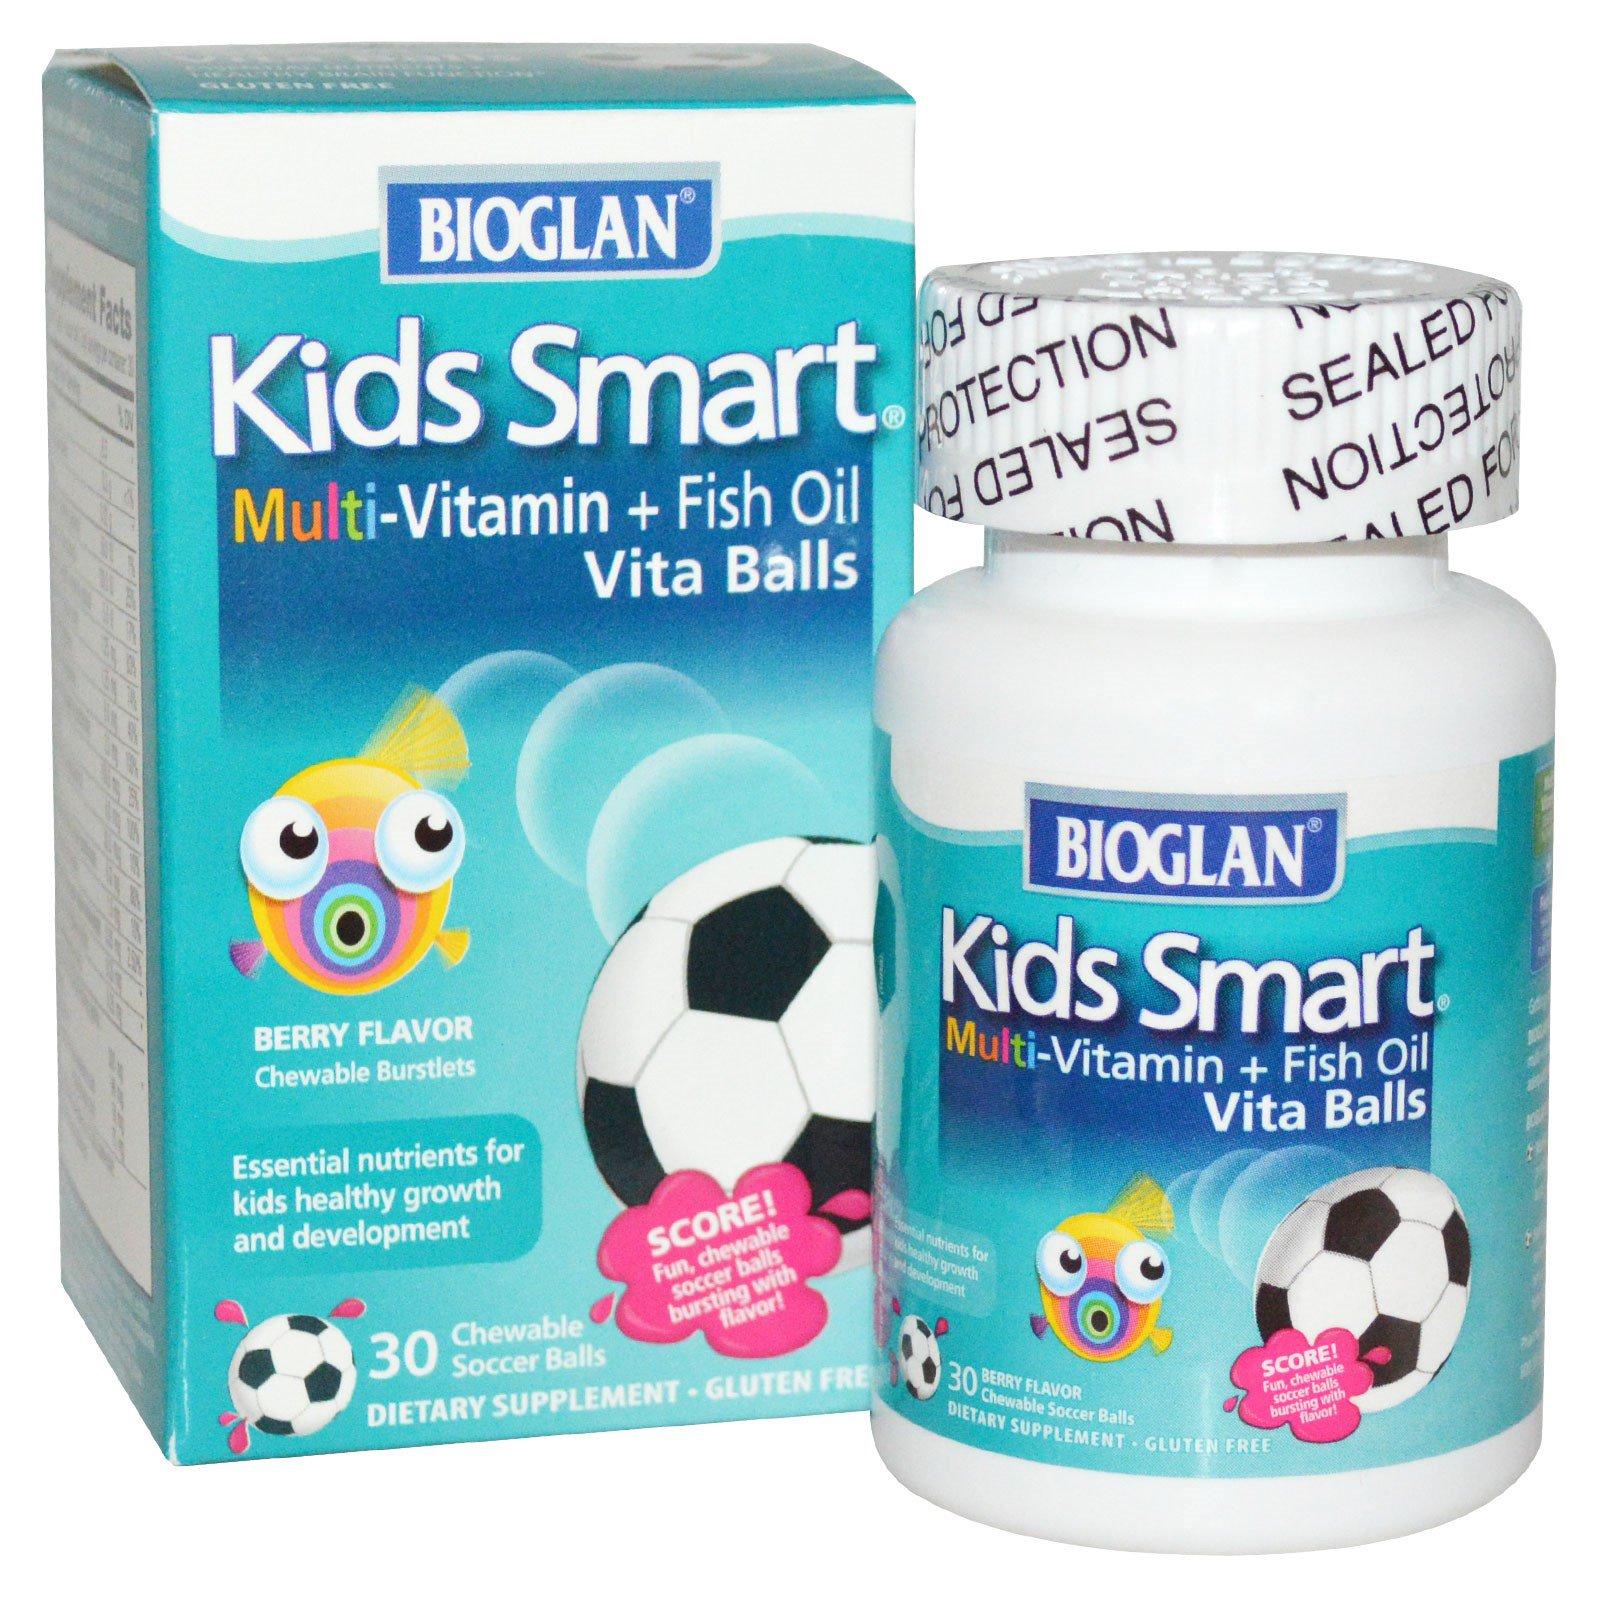 Bioglan kids smart multi vitamin fish oil vita balls for Multivitamin with fish oil